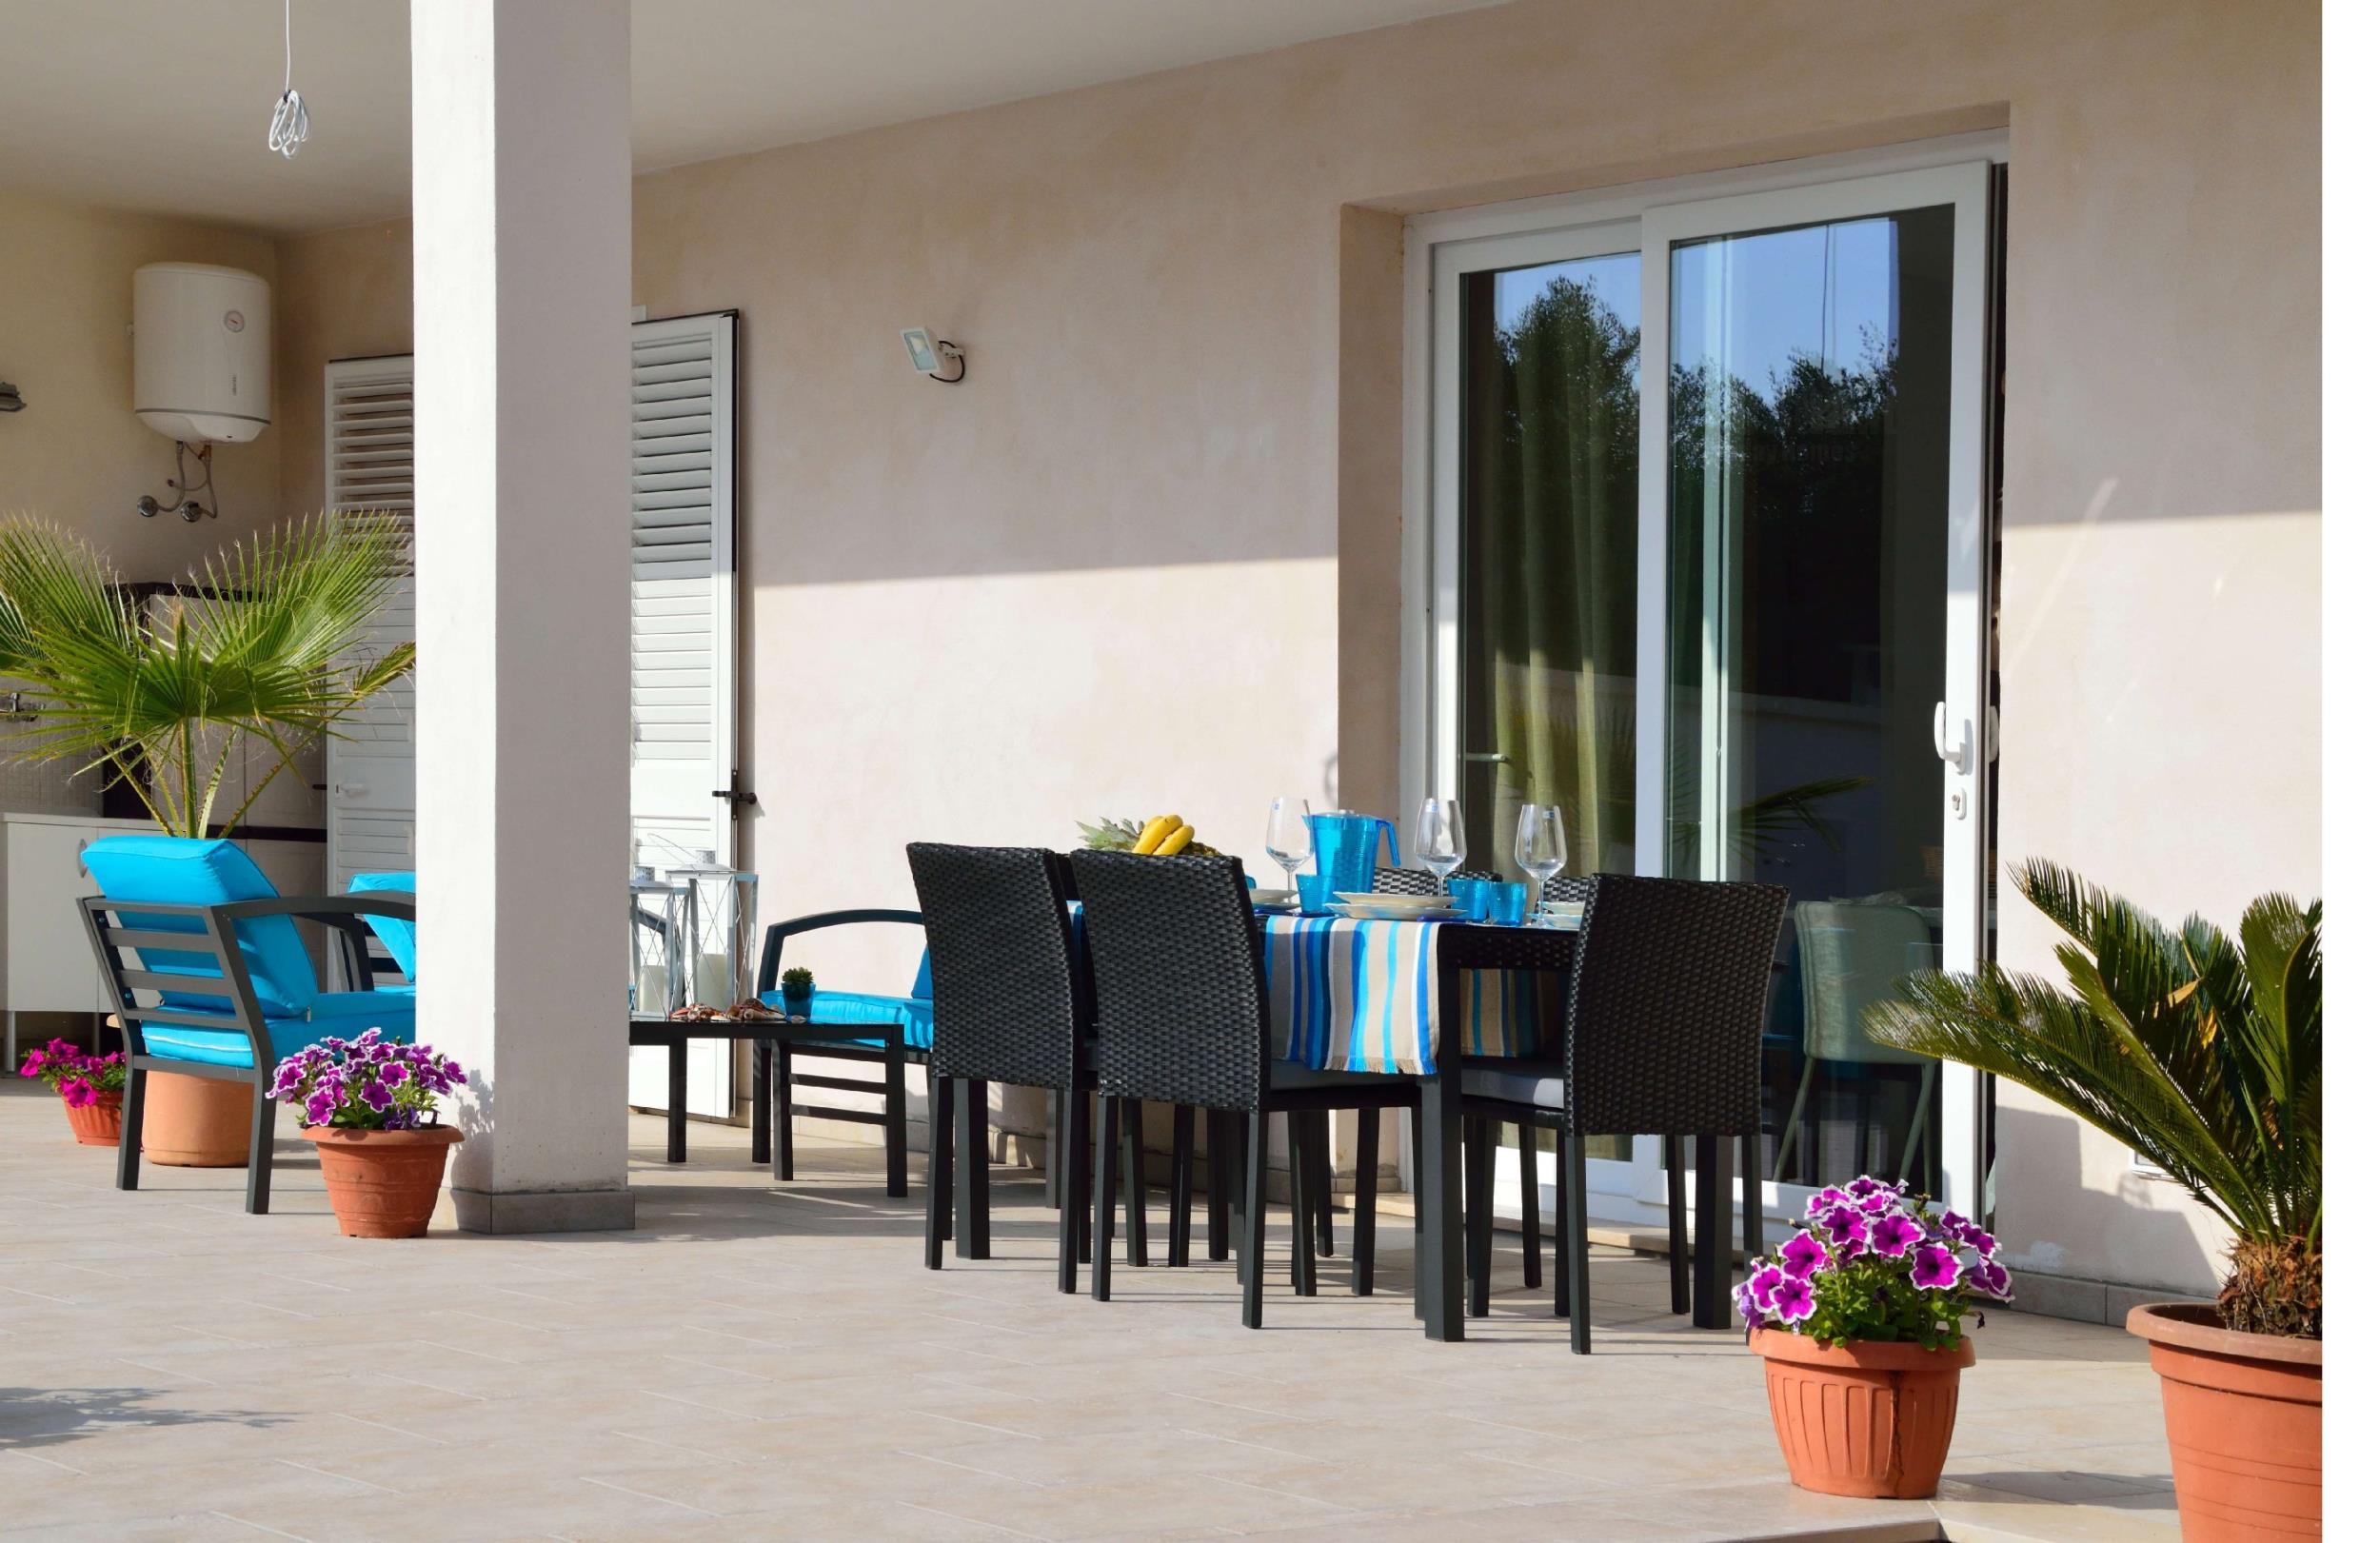 Apartment Elcisia luxe beach house photo 23457092